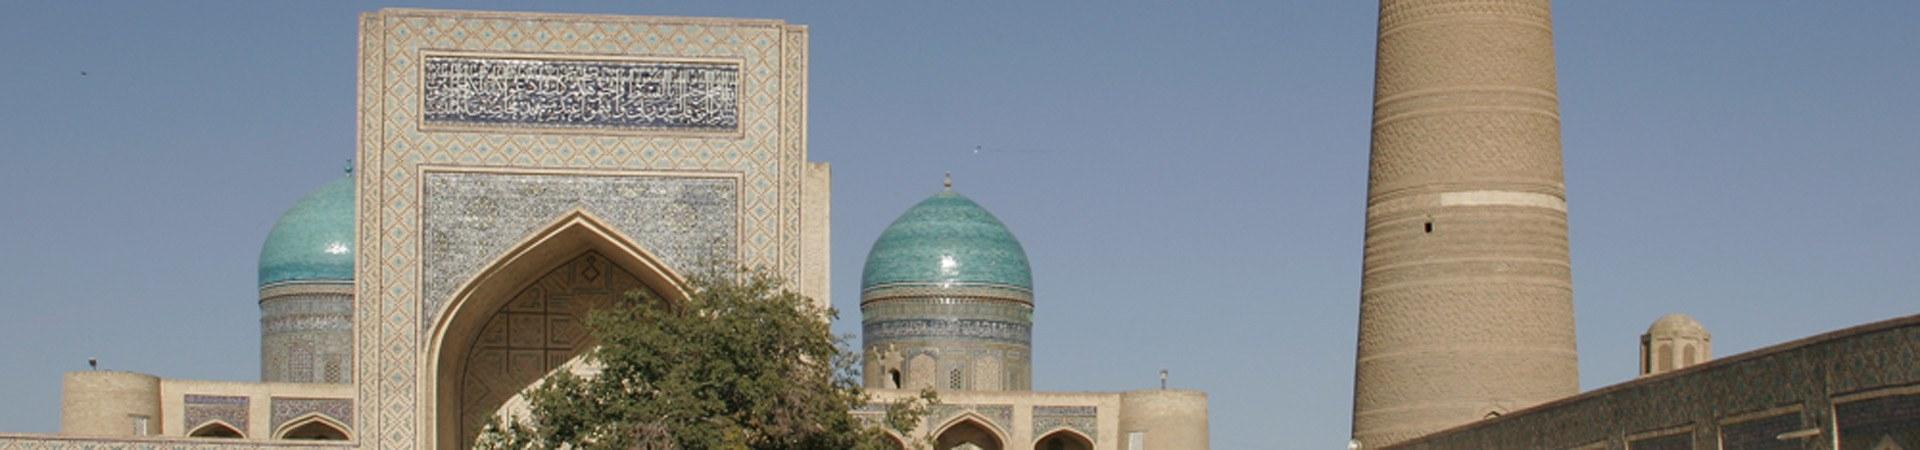 Radreise Usbekistan/Tadschikistan